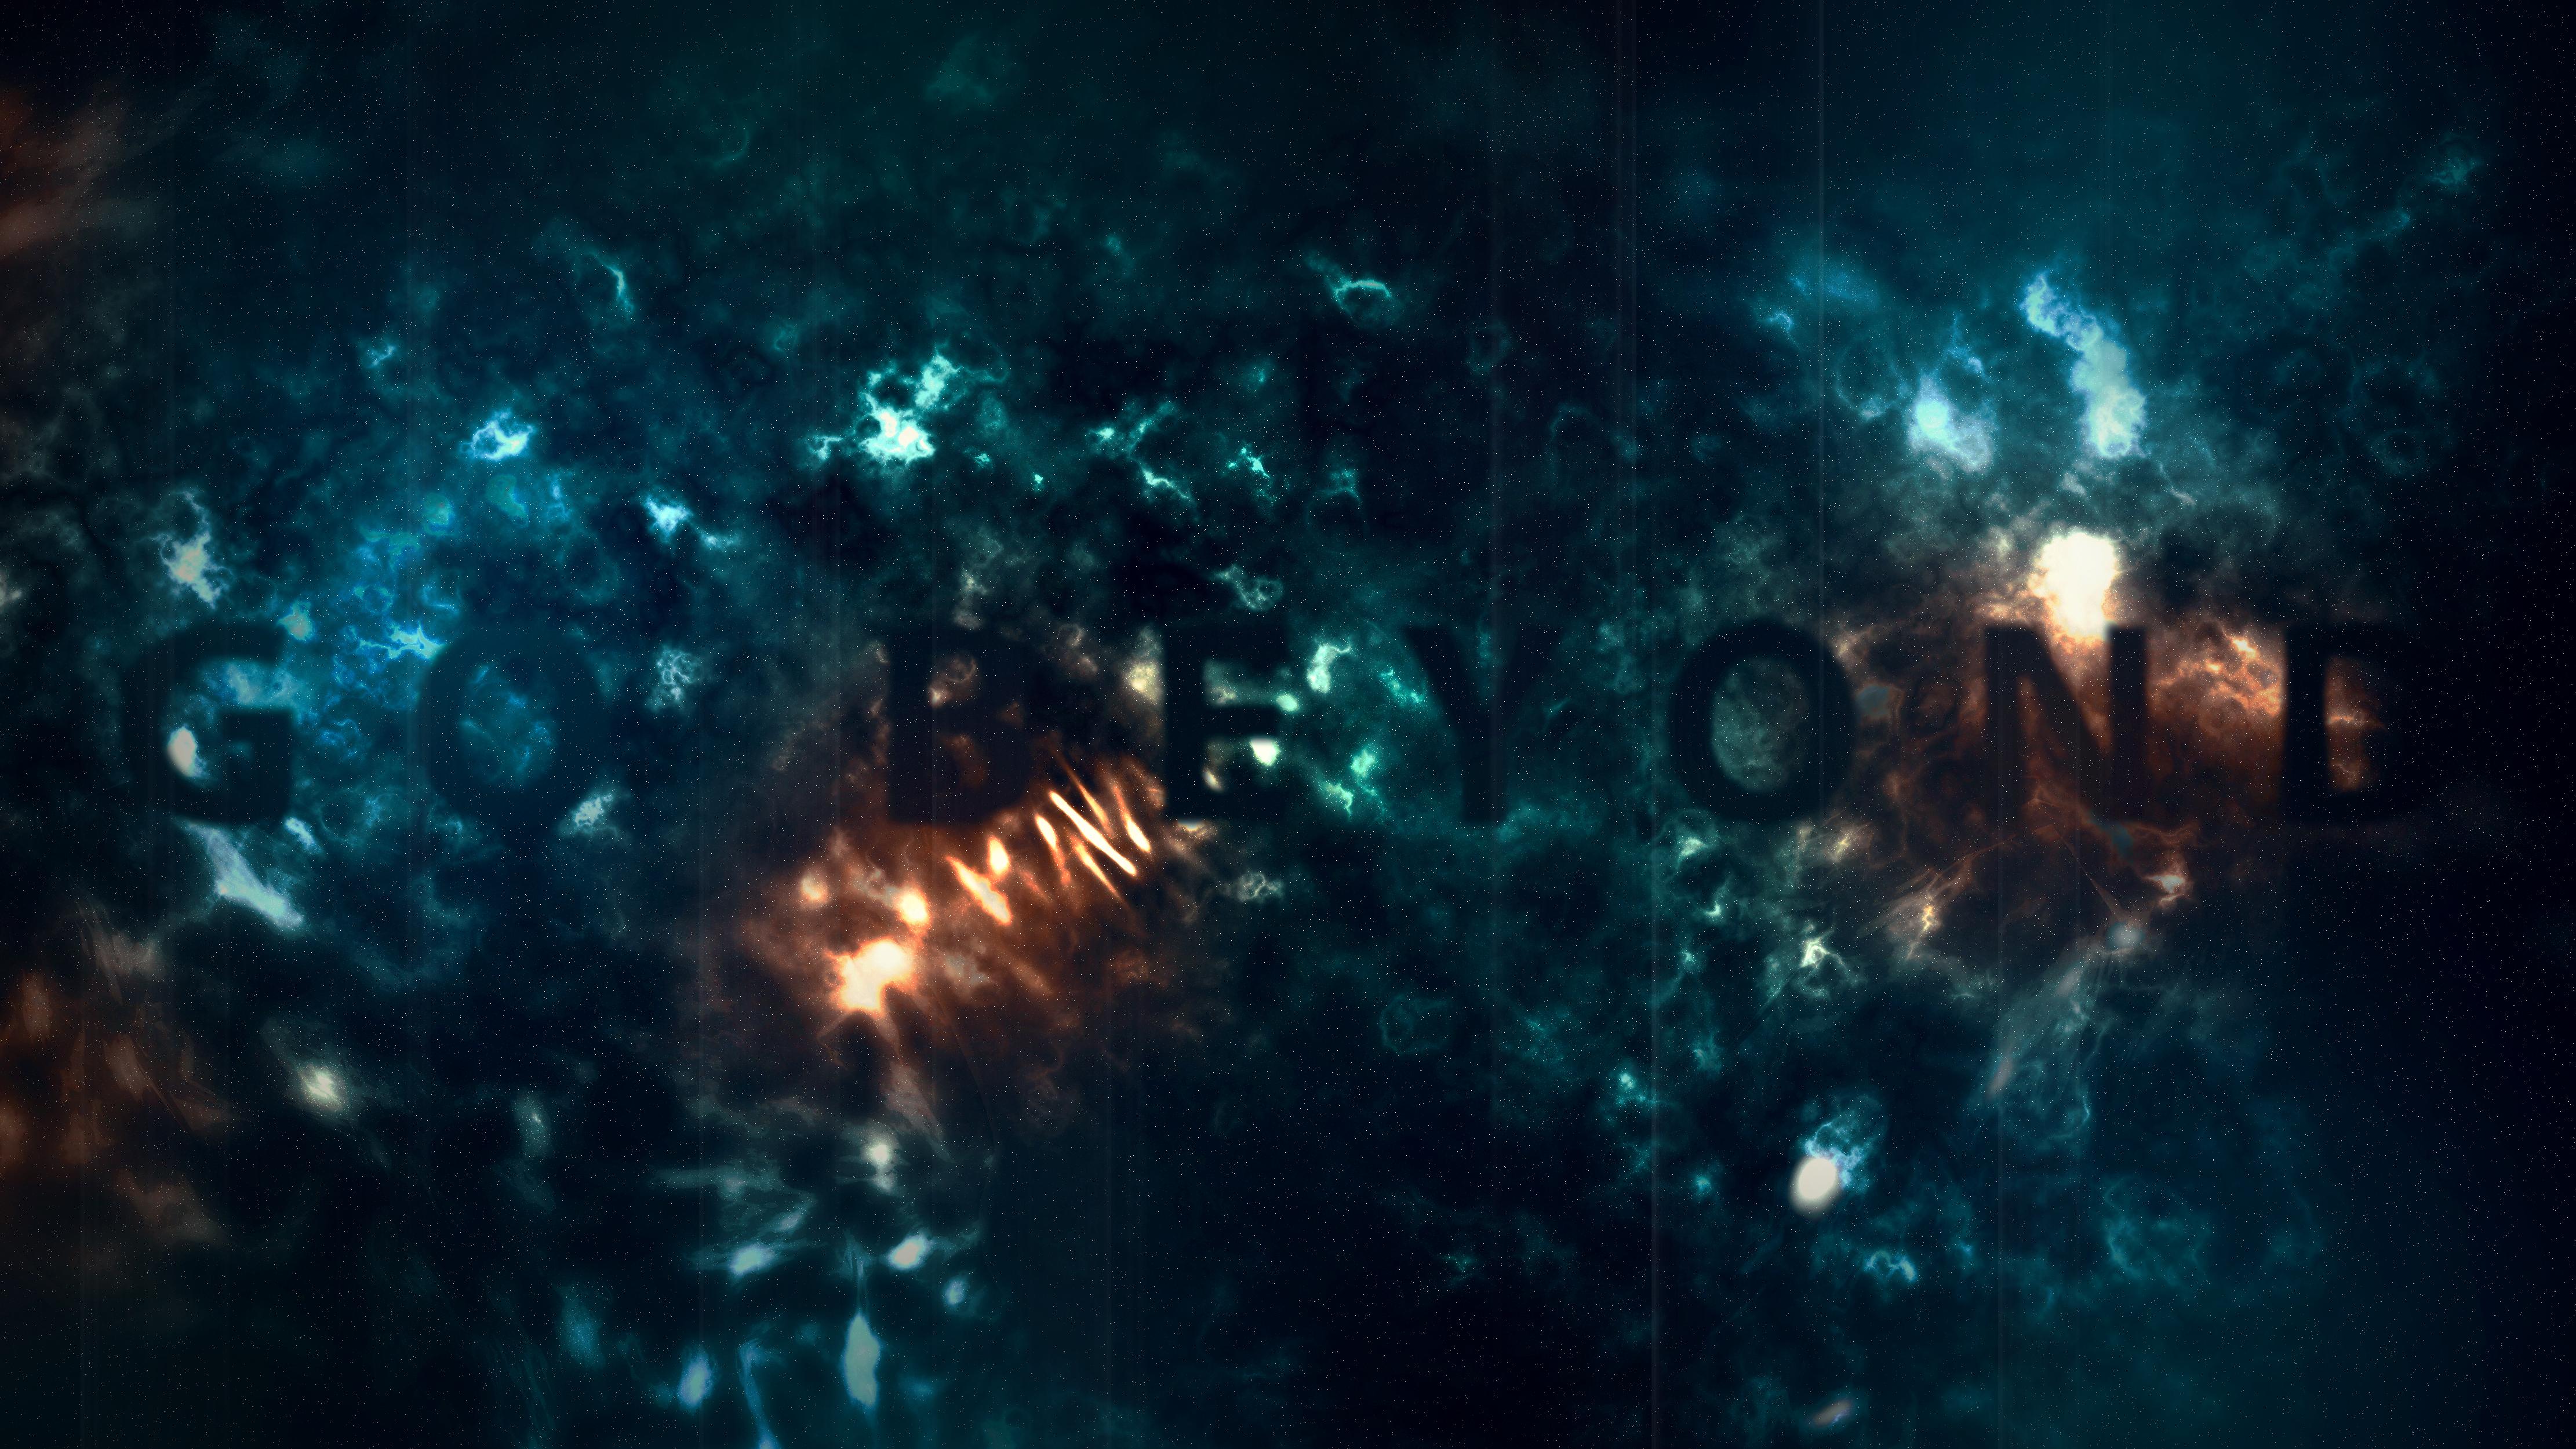 Go Beyond Plus Ultra 4k Ultra Hd Wallpaper Background Image